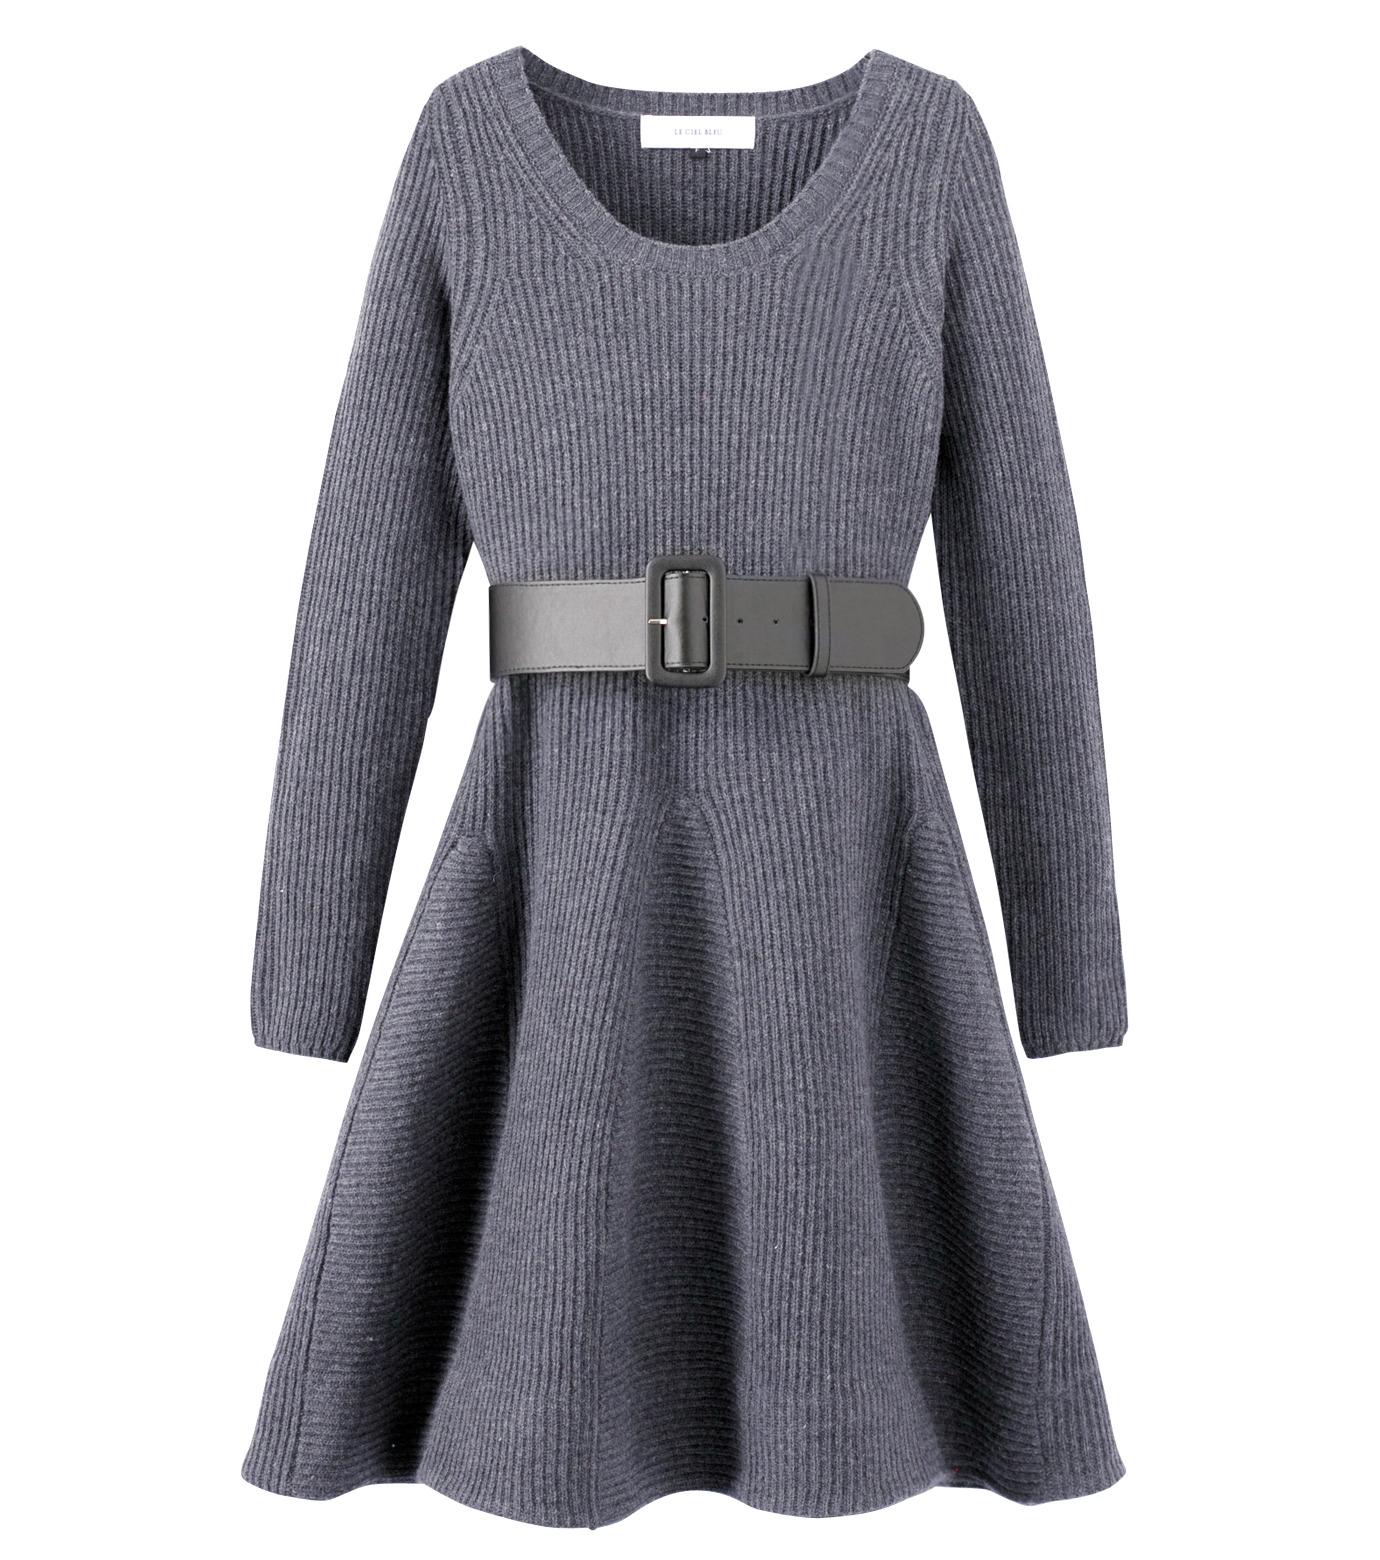 LE CIEL BLEU(ルシェルブルー)のRib Stitch Flare Crewneck Dress-GRAY-15A65025 拡大詳細画像1